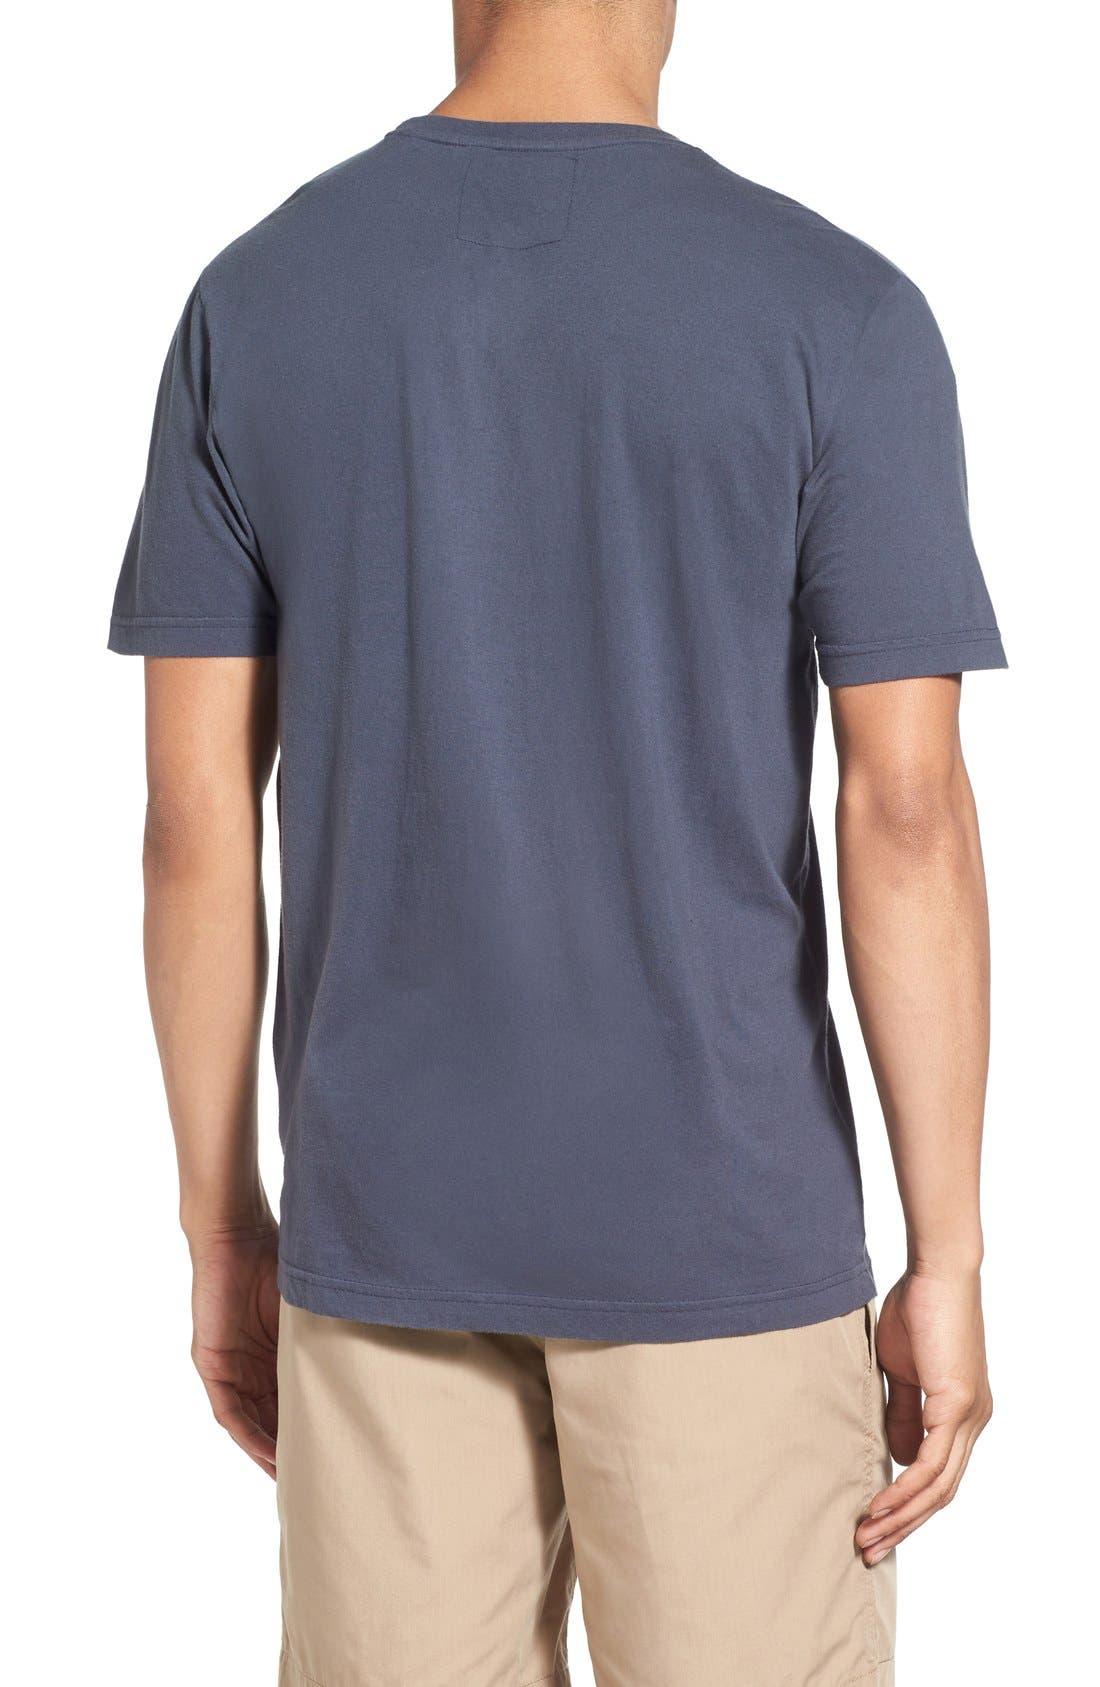 'Los Angeles Angels - Brass Tacks' Trim Fit T-Shirt,                             Alternate thumbnail 2, color,                             410